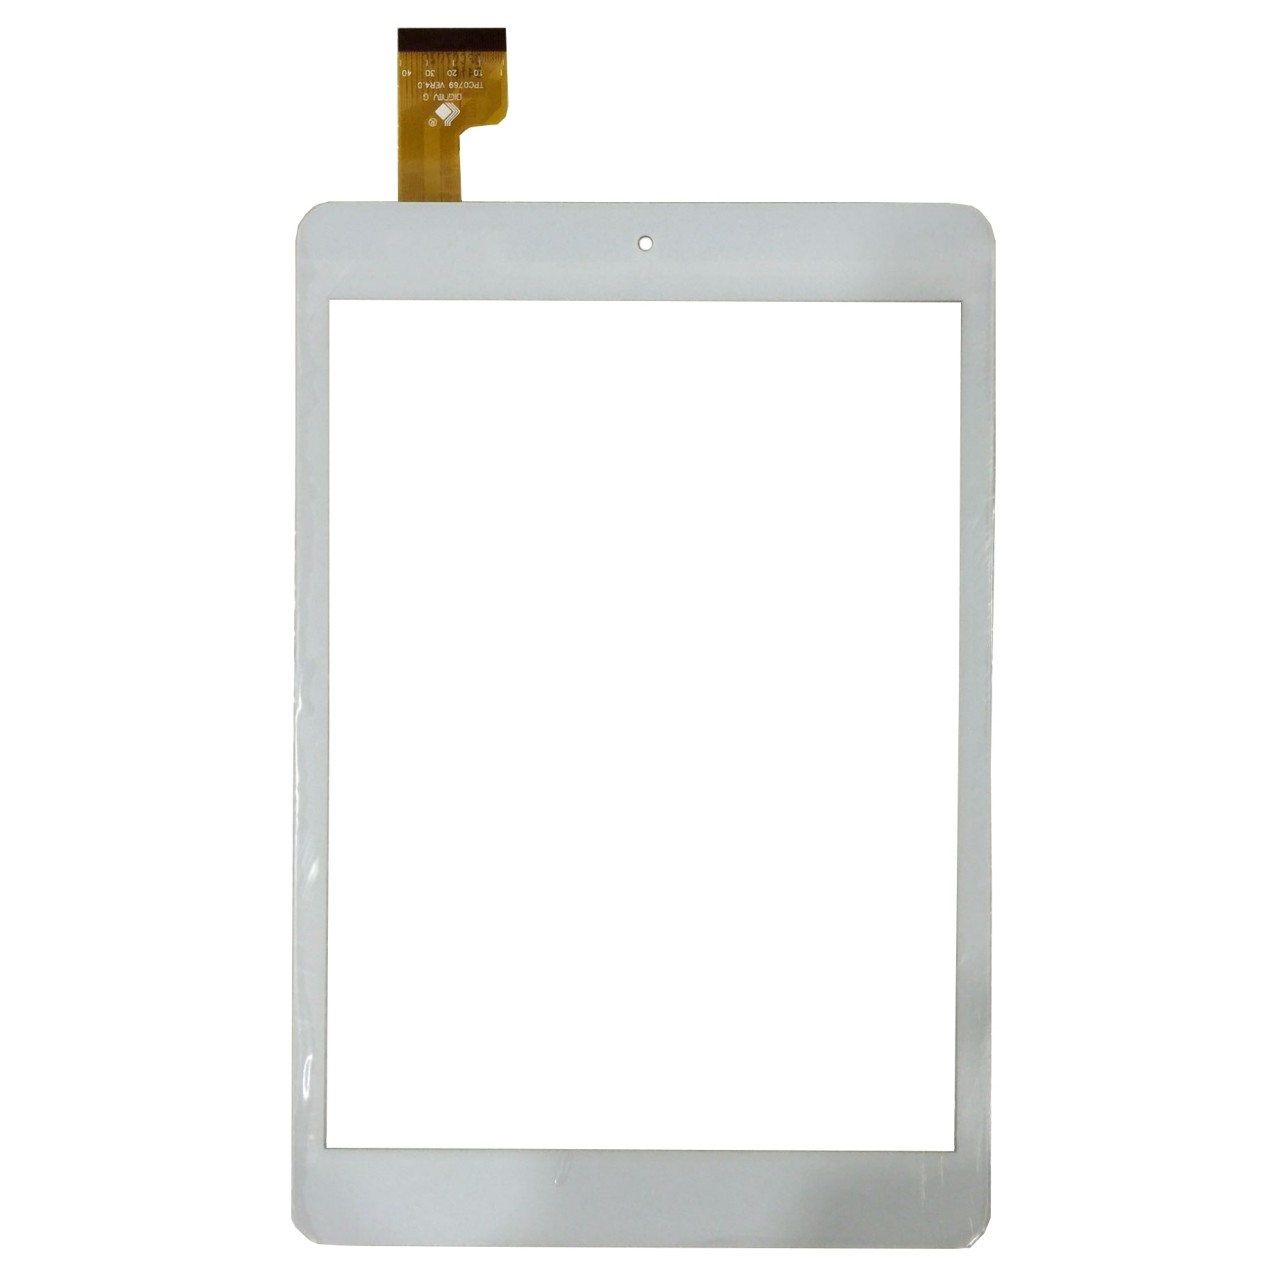 Touchscreen Digitizer Quer KOM0702 Alb Geam Sticla Tableta imagine powerlaptop.ro 2021